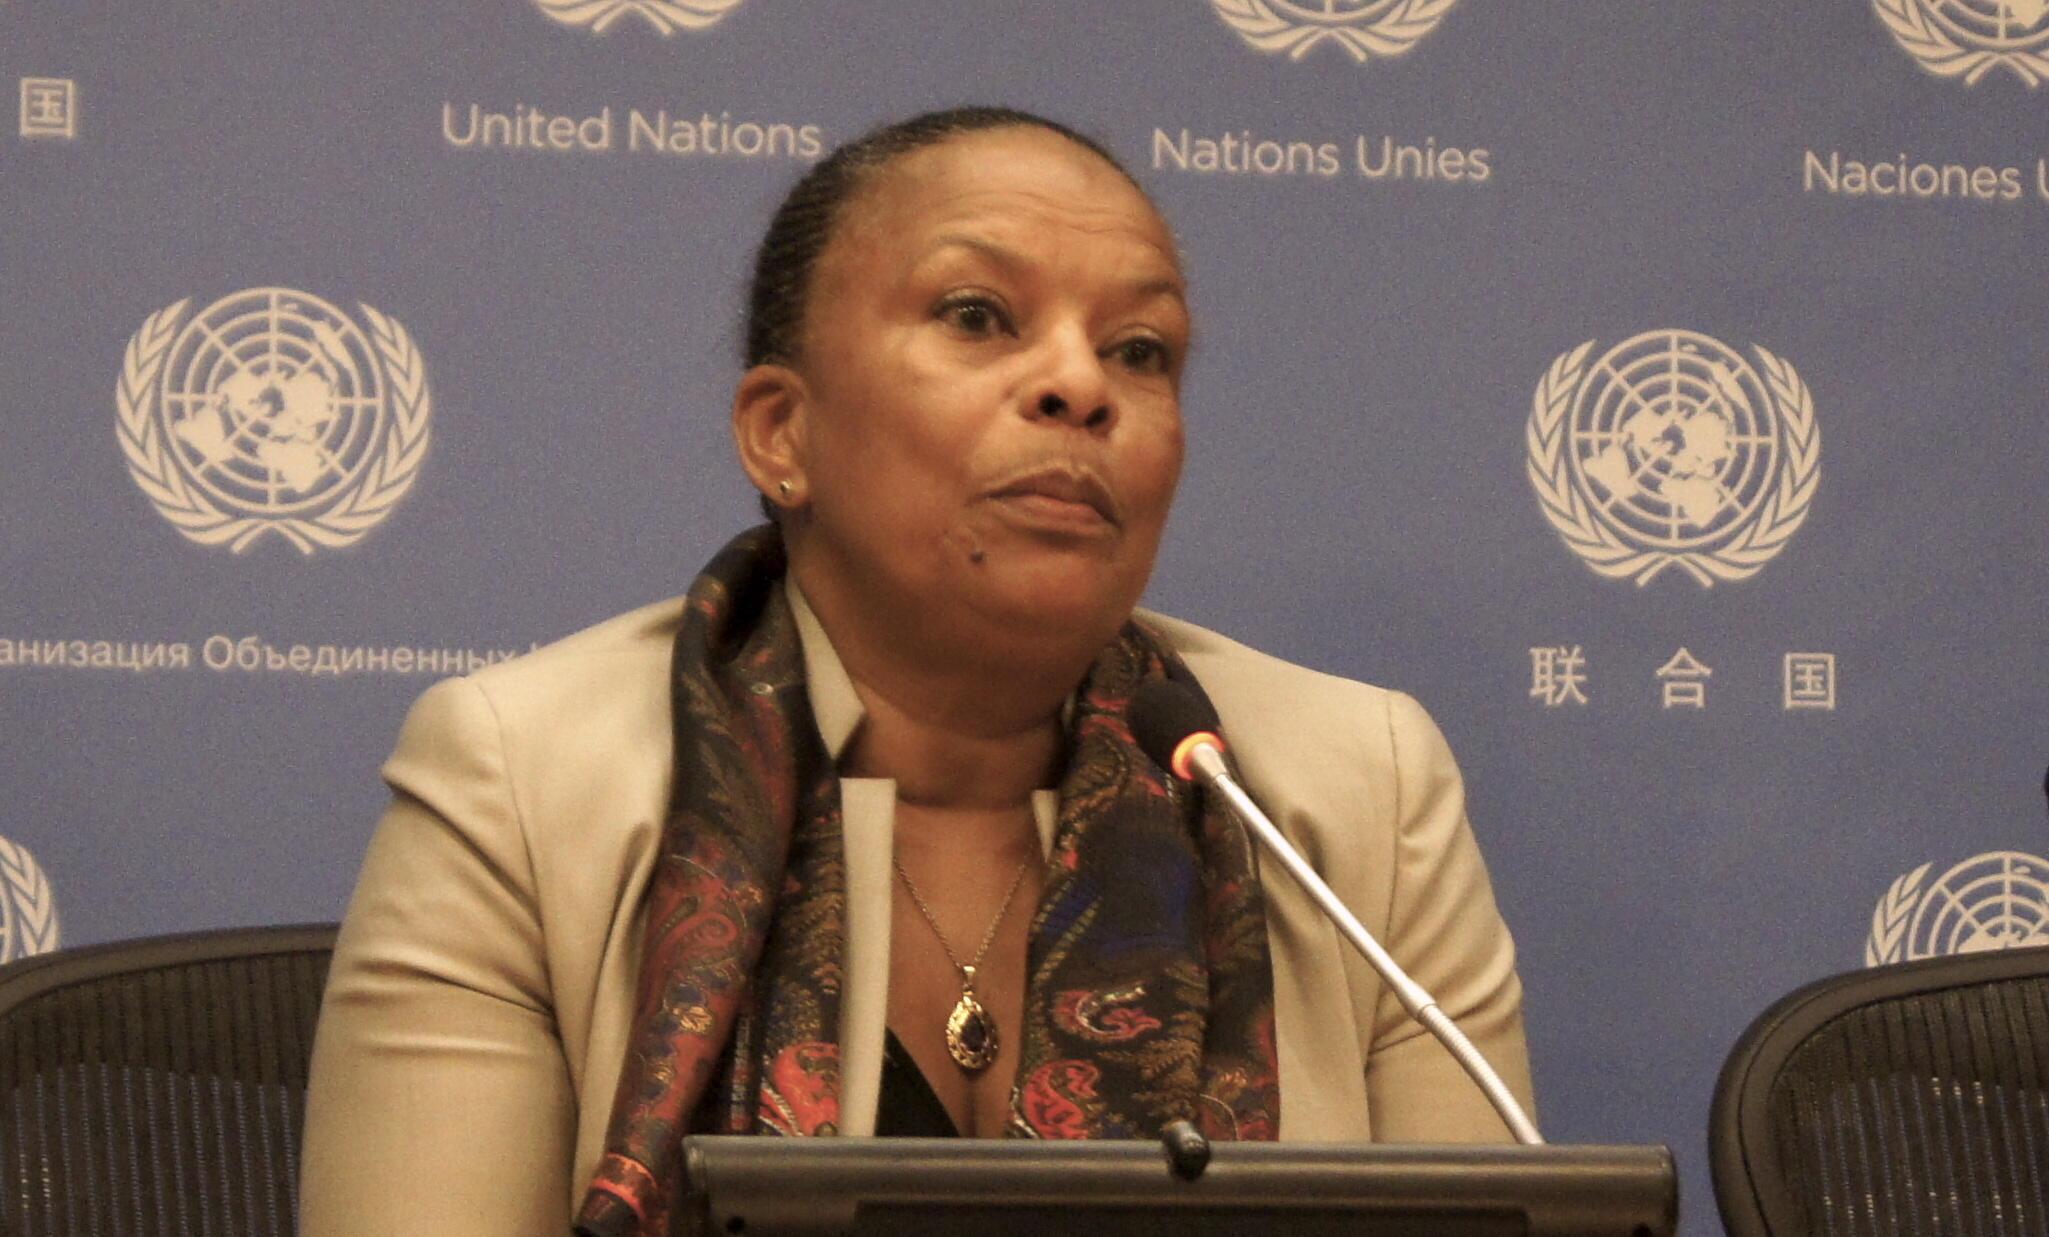 Christiane Taubira speaks at the UN on Tuesday